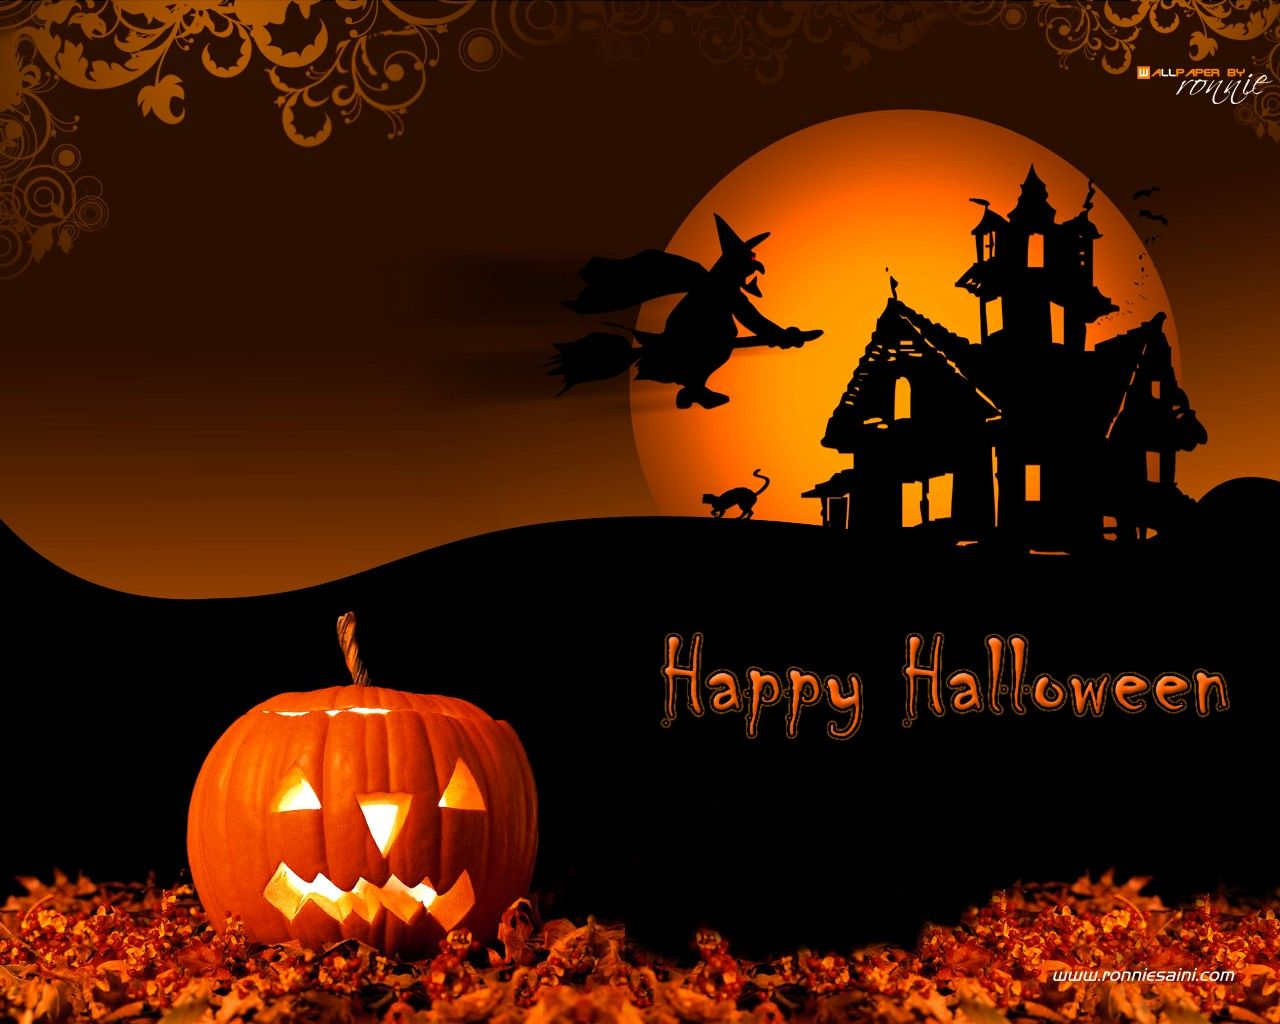 Cool Wallpaper Halloween Unique - d314022e8399e02df6c375b508ee180d  Photograph_882586.jpg